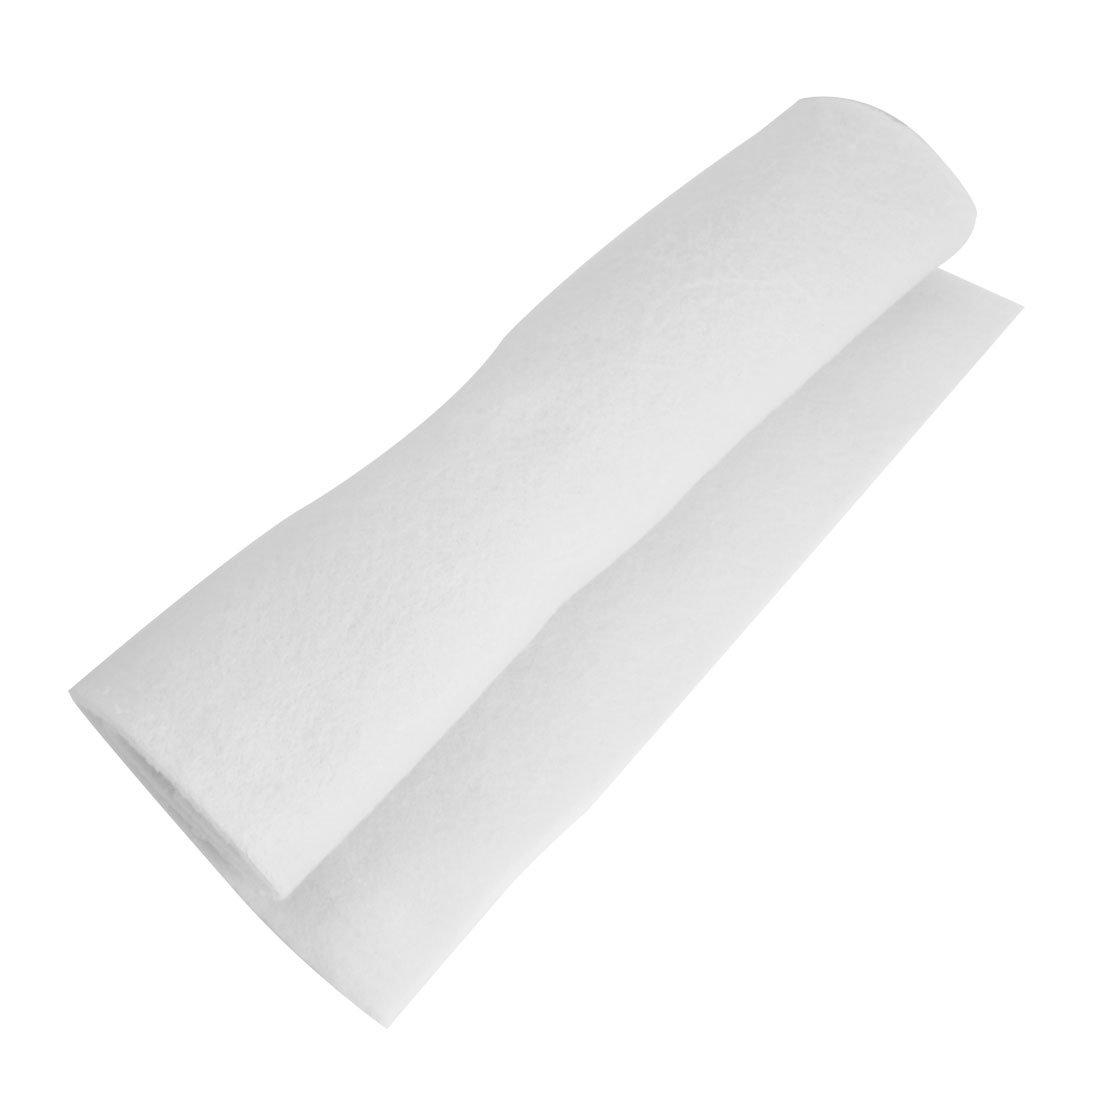 Fish Tank Biochimica bio spugna filtro Pad bianco 54,1cm Dragonmart a12071100ux0576